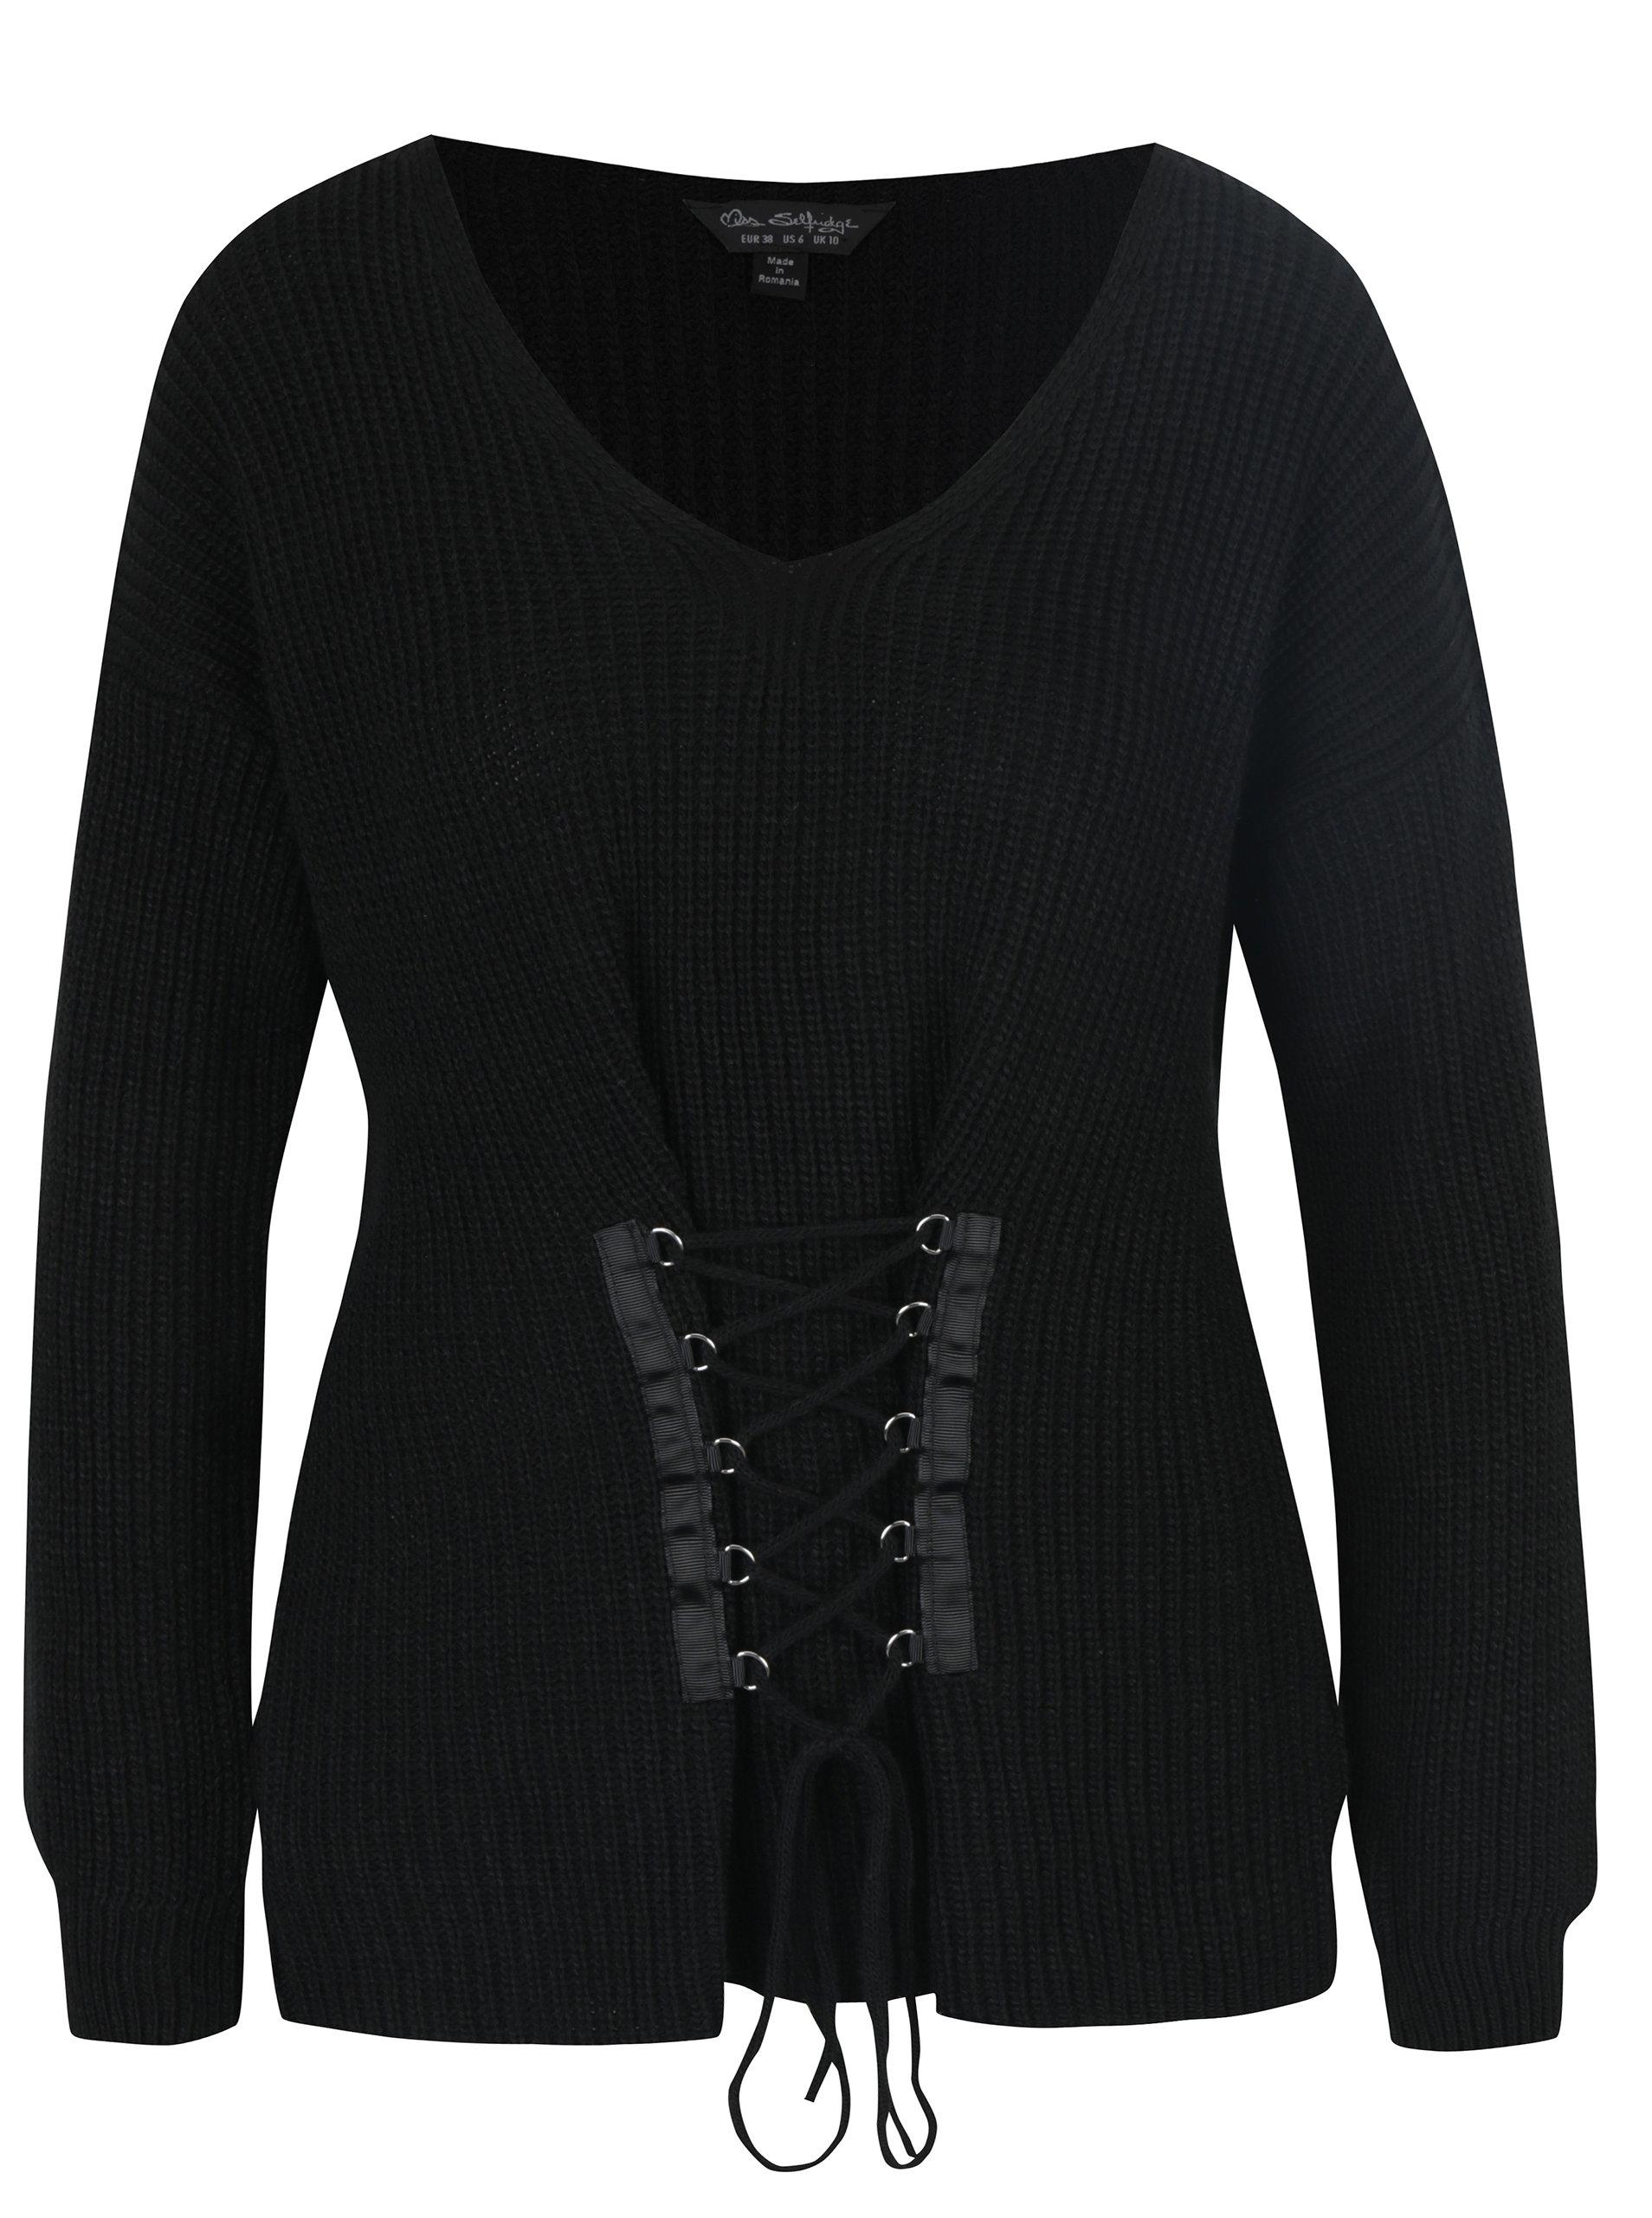 4d648360096f Čierny sveter so šnurovaním Miss Selfridge ...